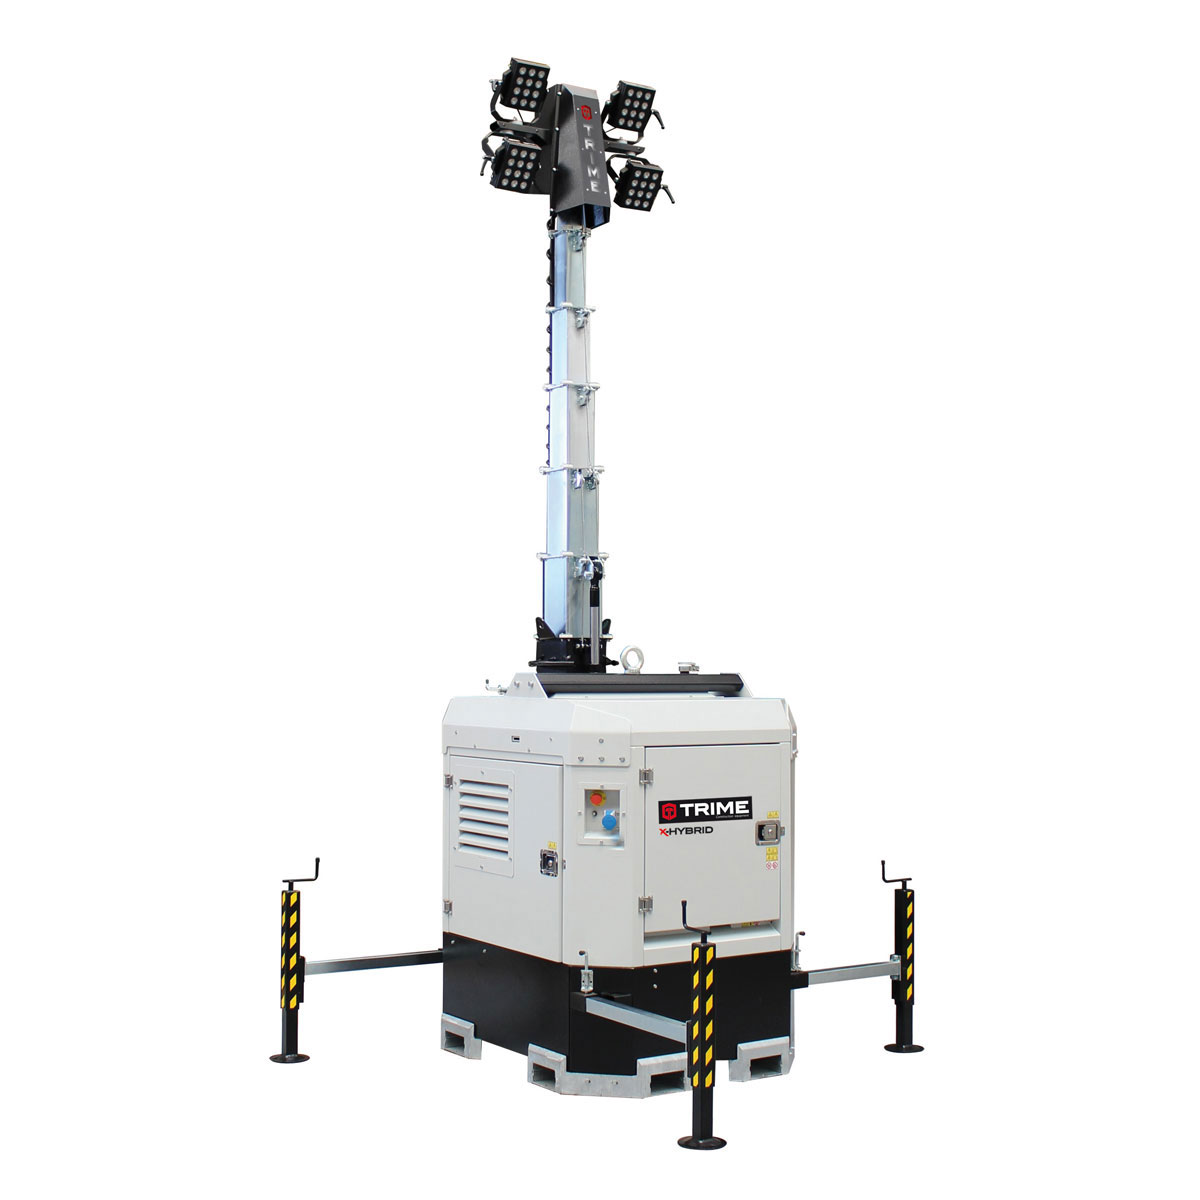 belysningsmast-led-x-hybrid-4x150W